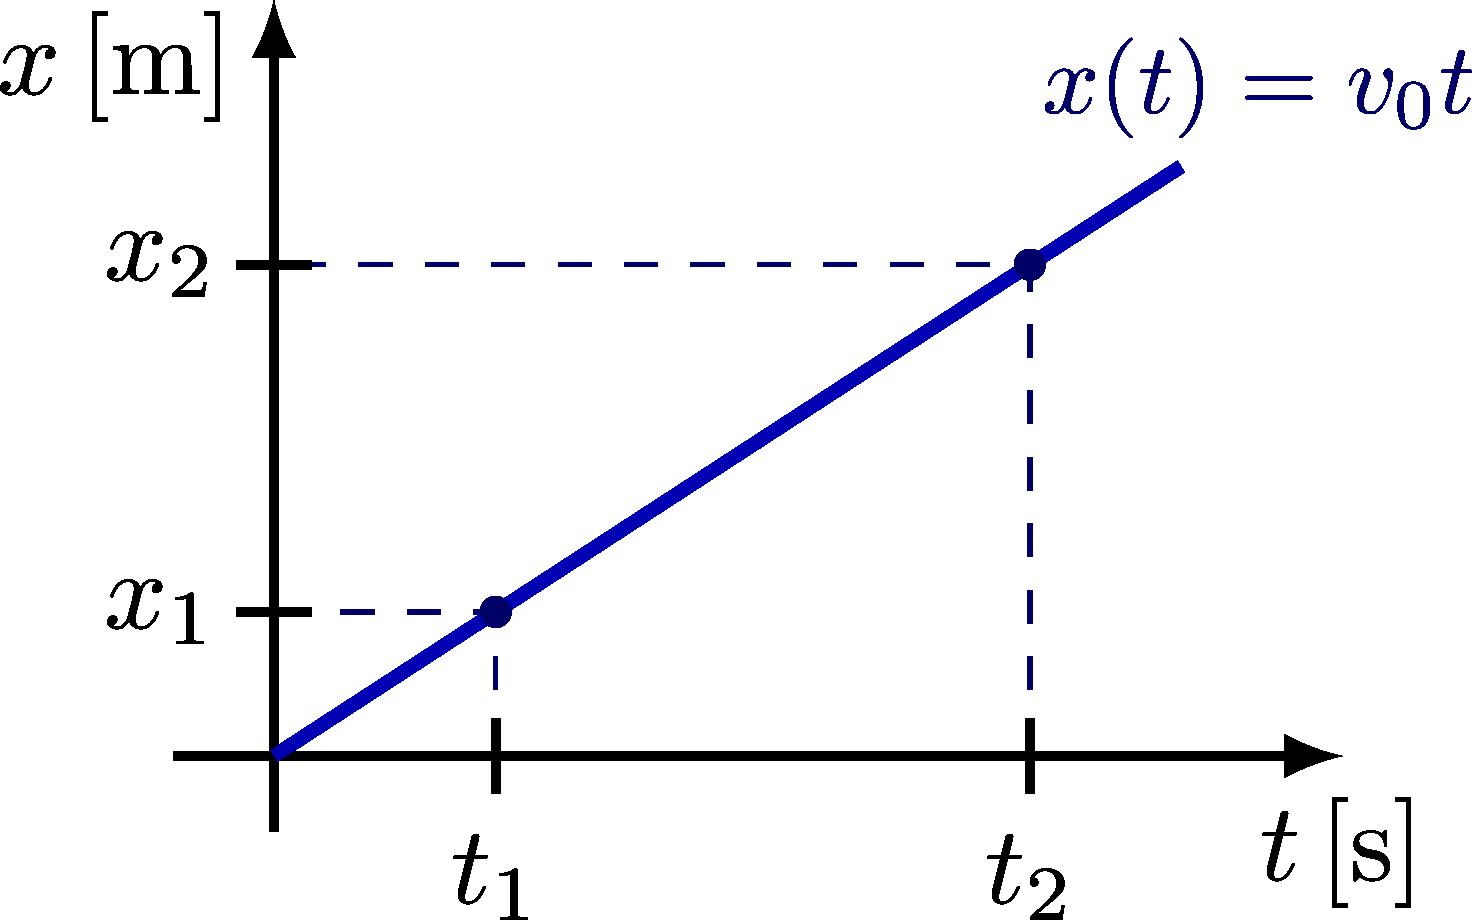 kinematics_curves-001.png